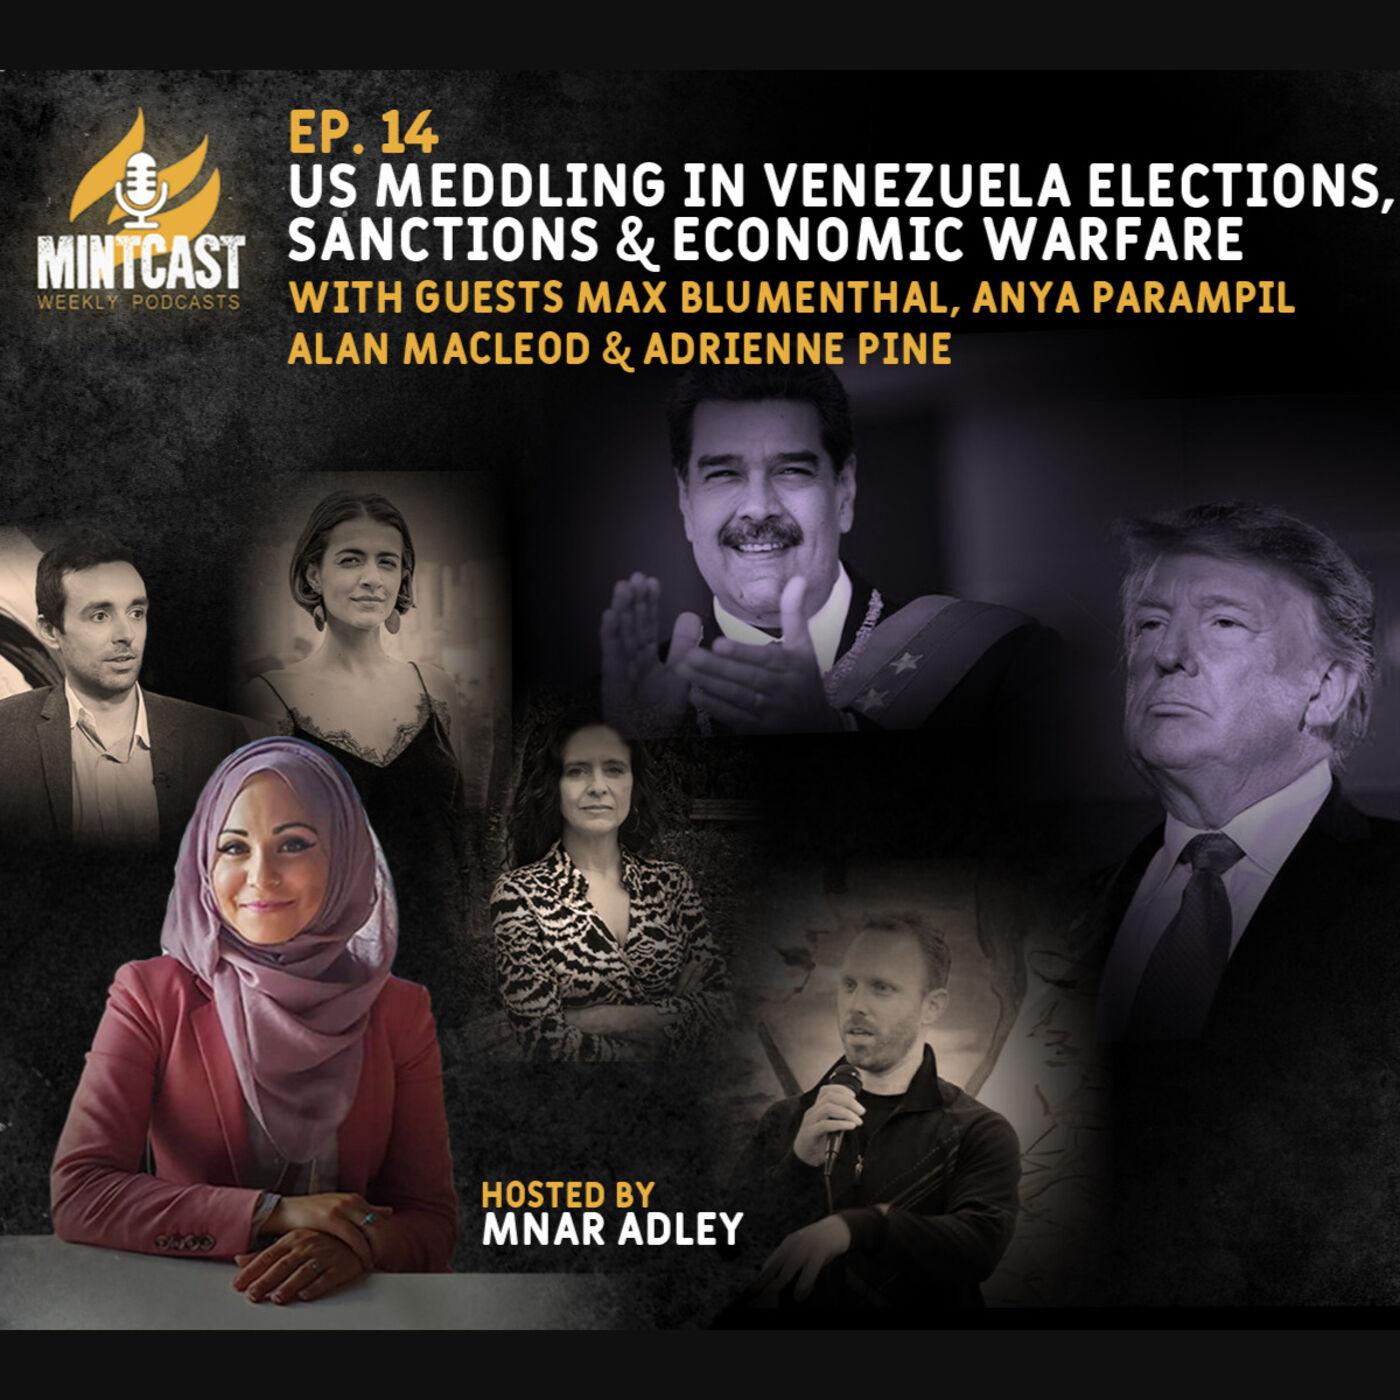 Podcast Panel: US Meddling In Venezuela Elections, Economic Warfare & COVID-19